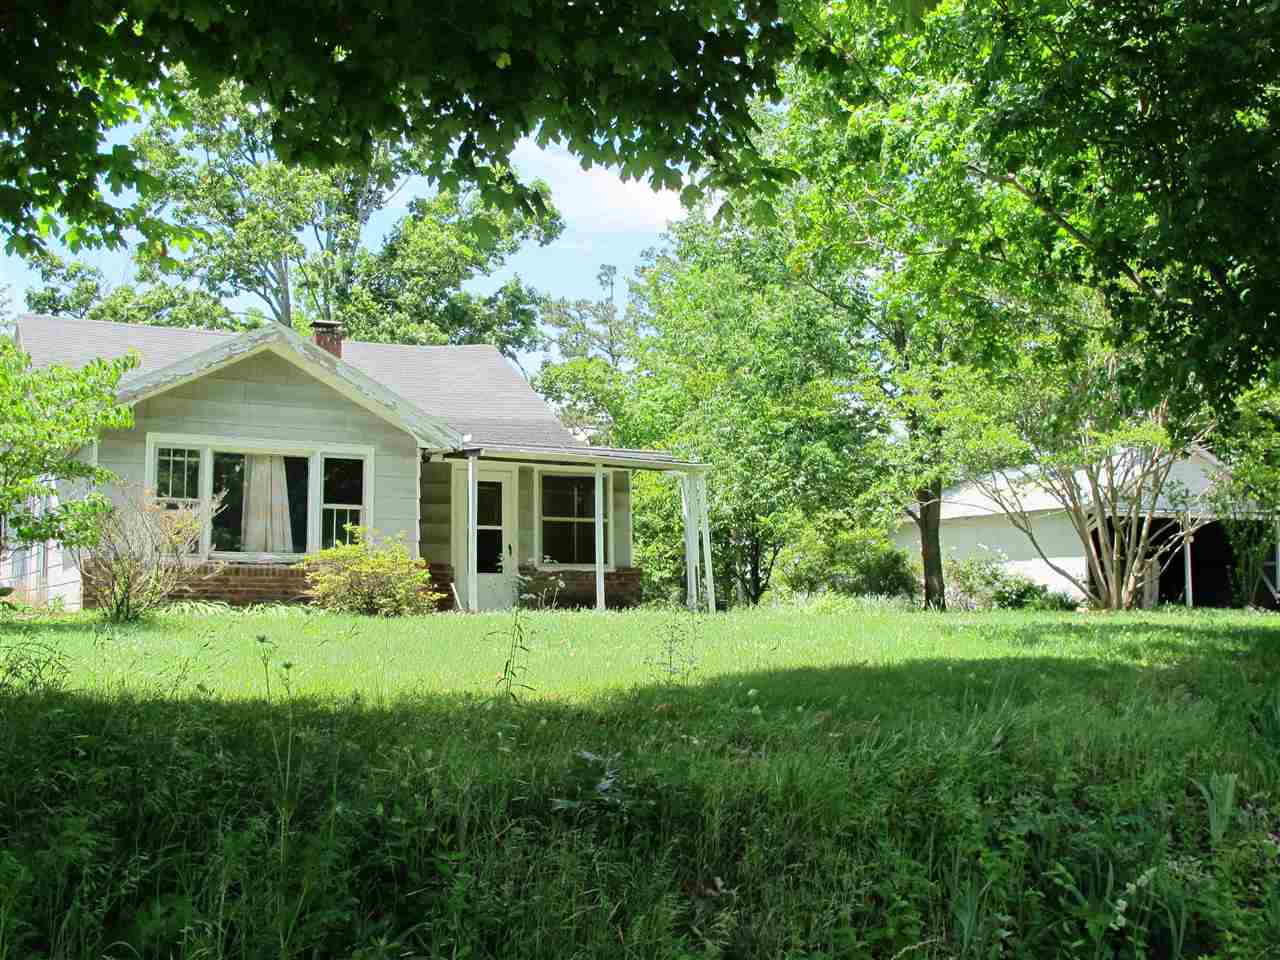 Real Estate for Sale, ListingId: 33563048, Eddyville,KY42038